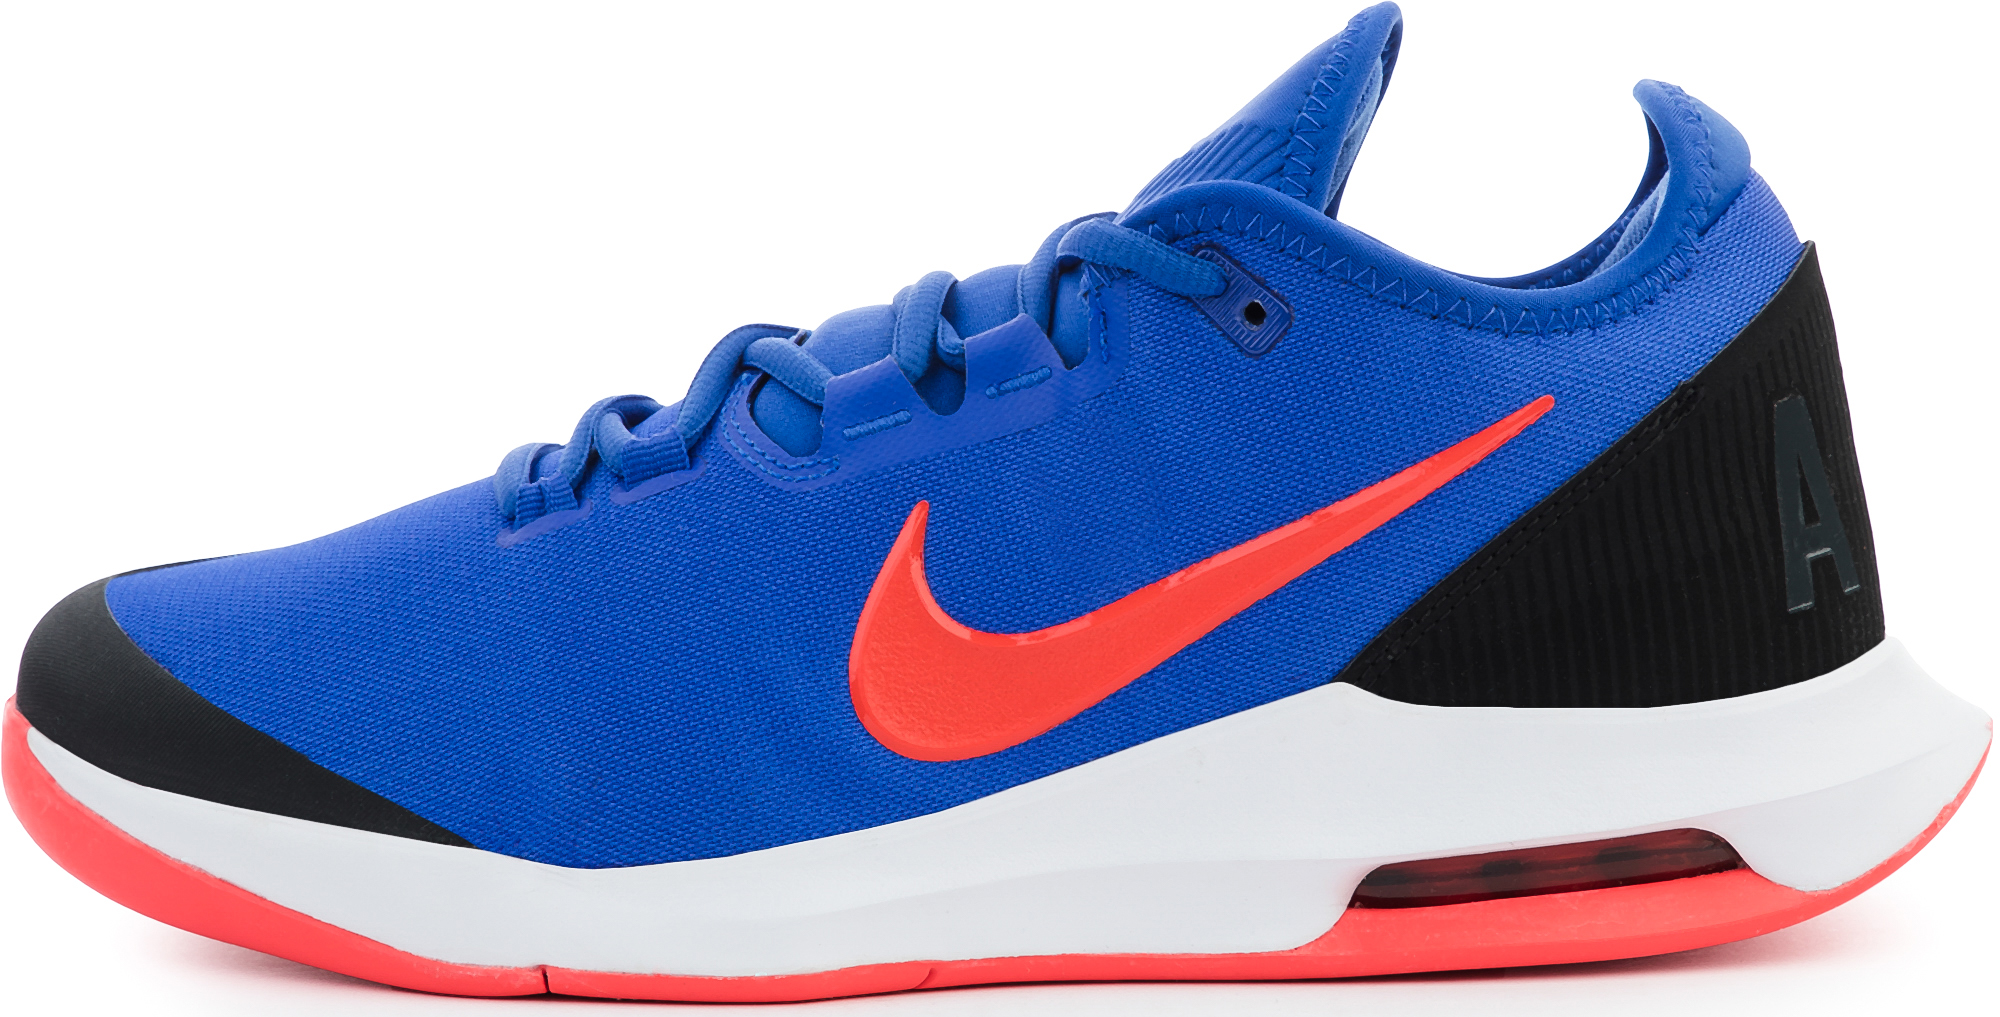 Nike Кроссовки мужские Nike Air Max Wildcard Hc, размер 46,5 цена 2017